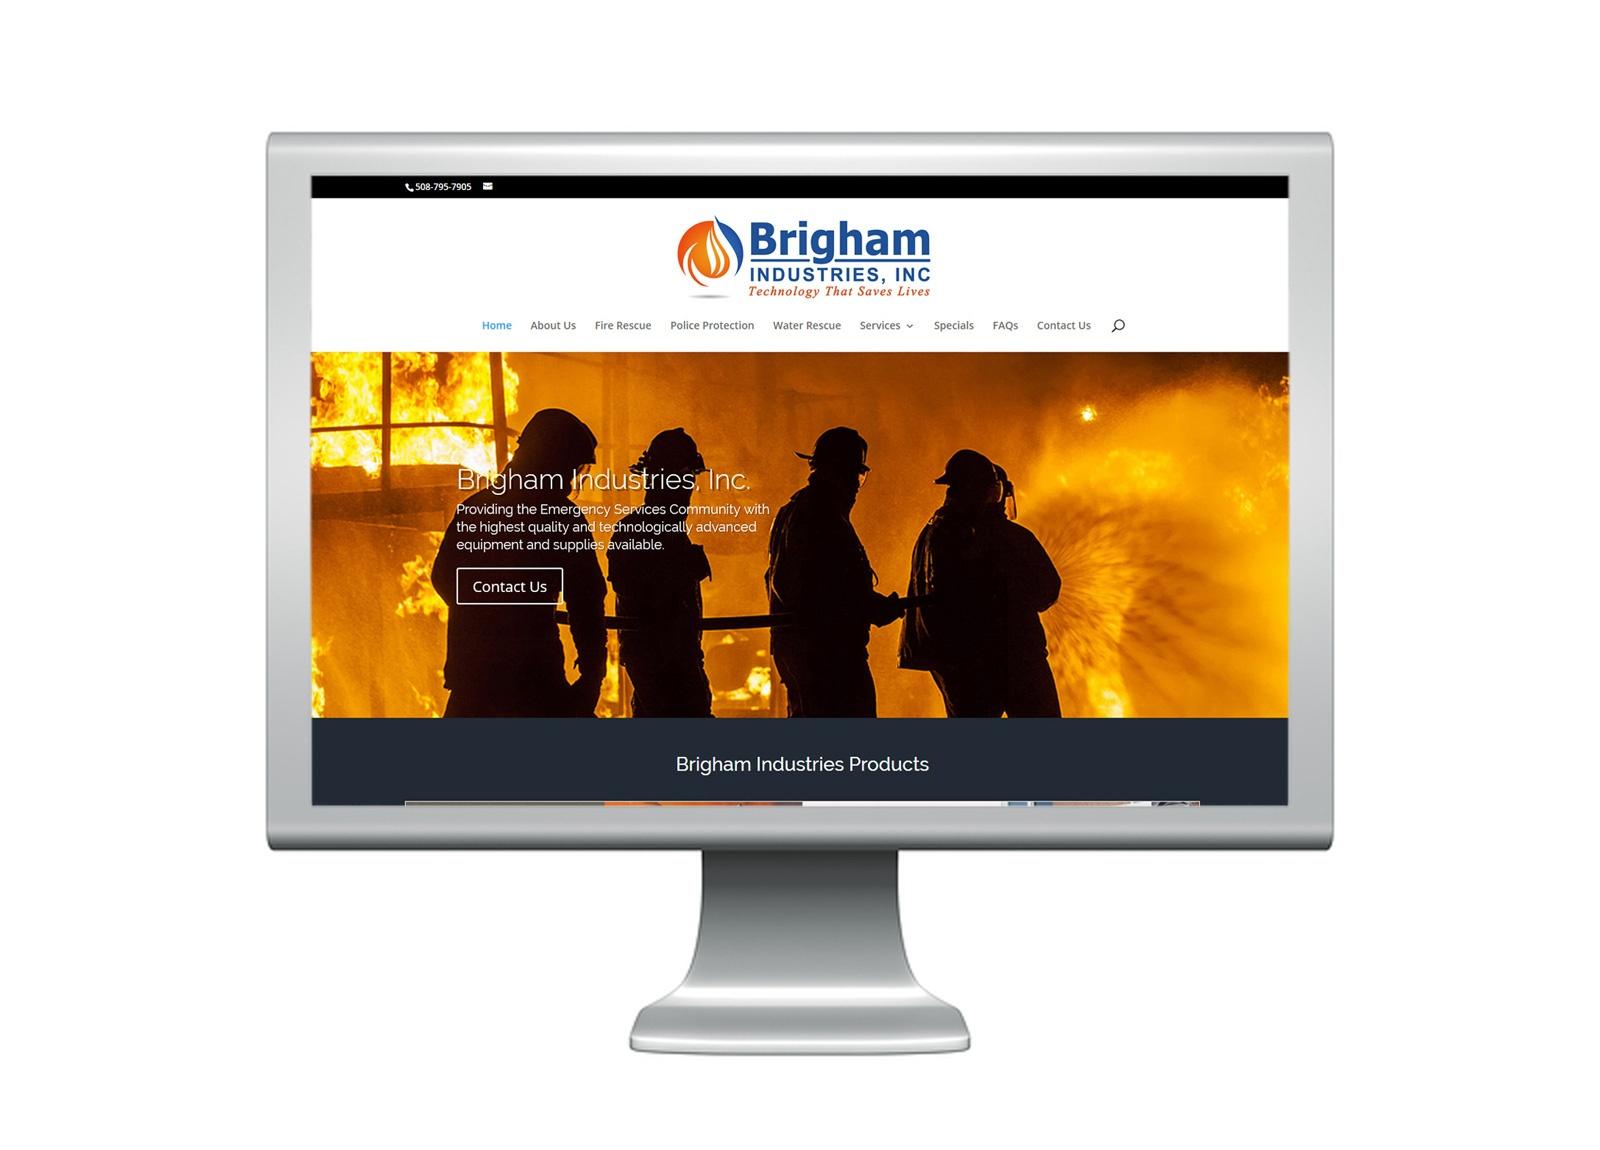 Brigham Industries